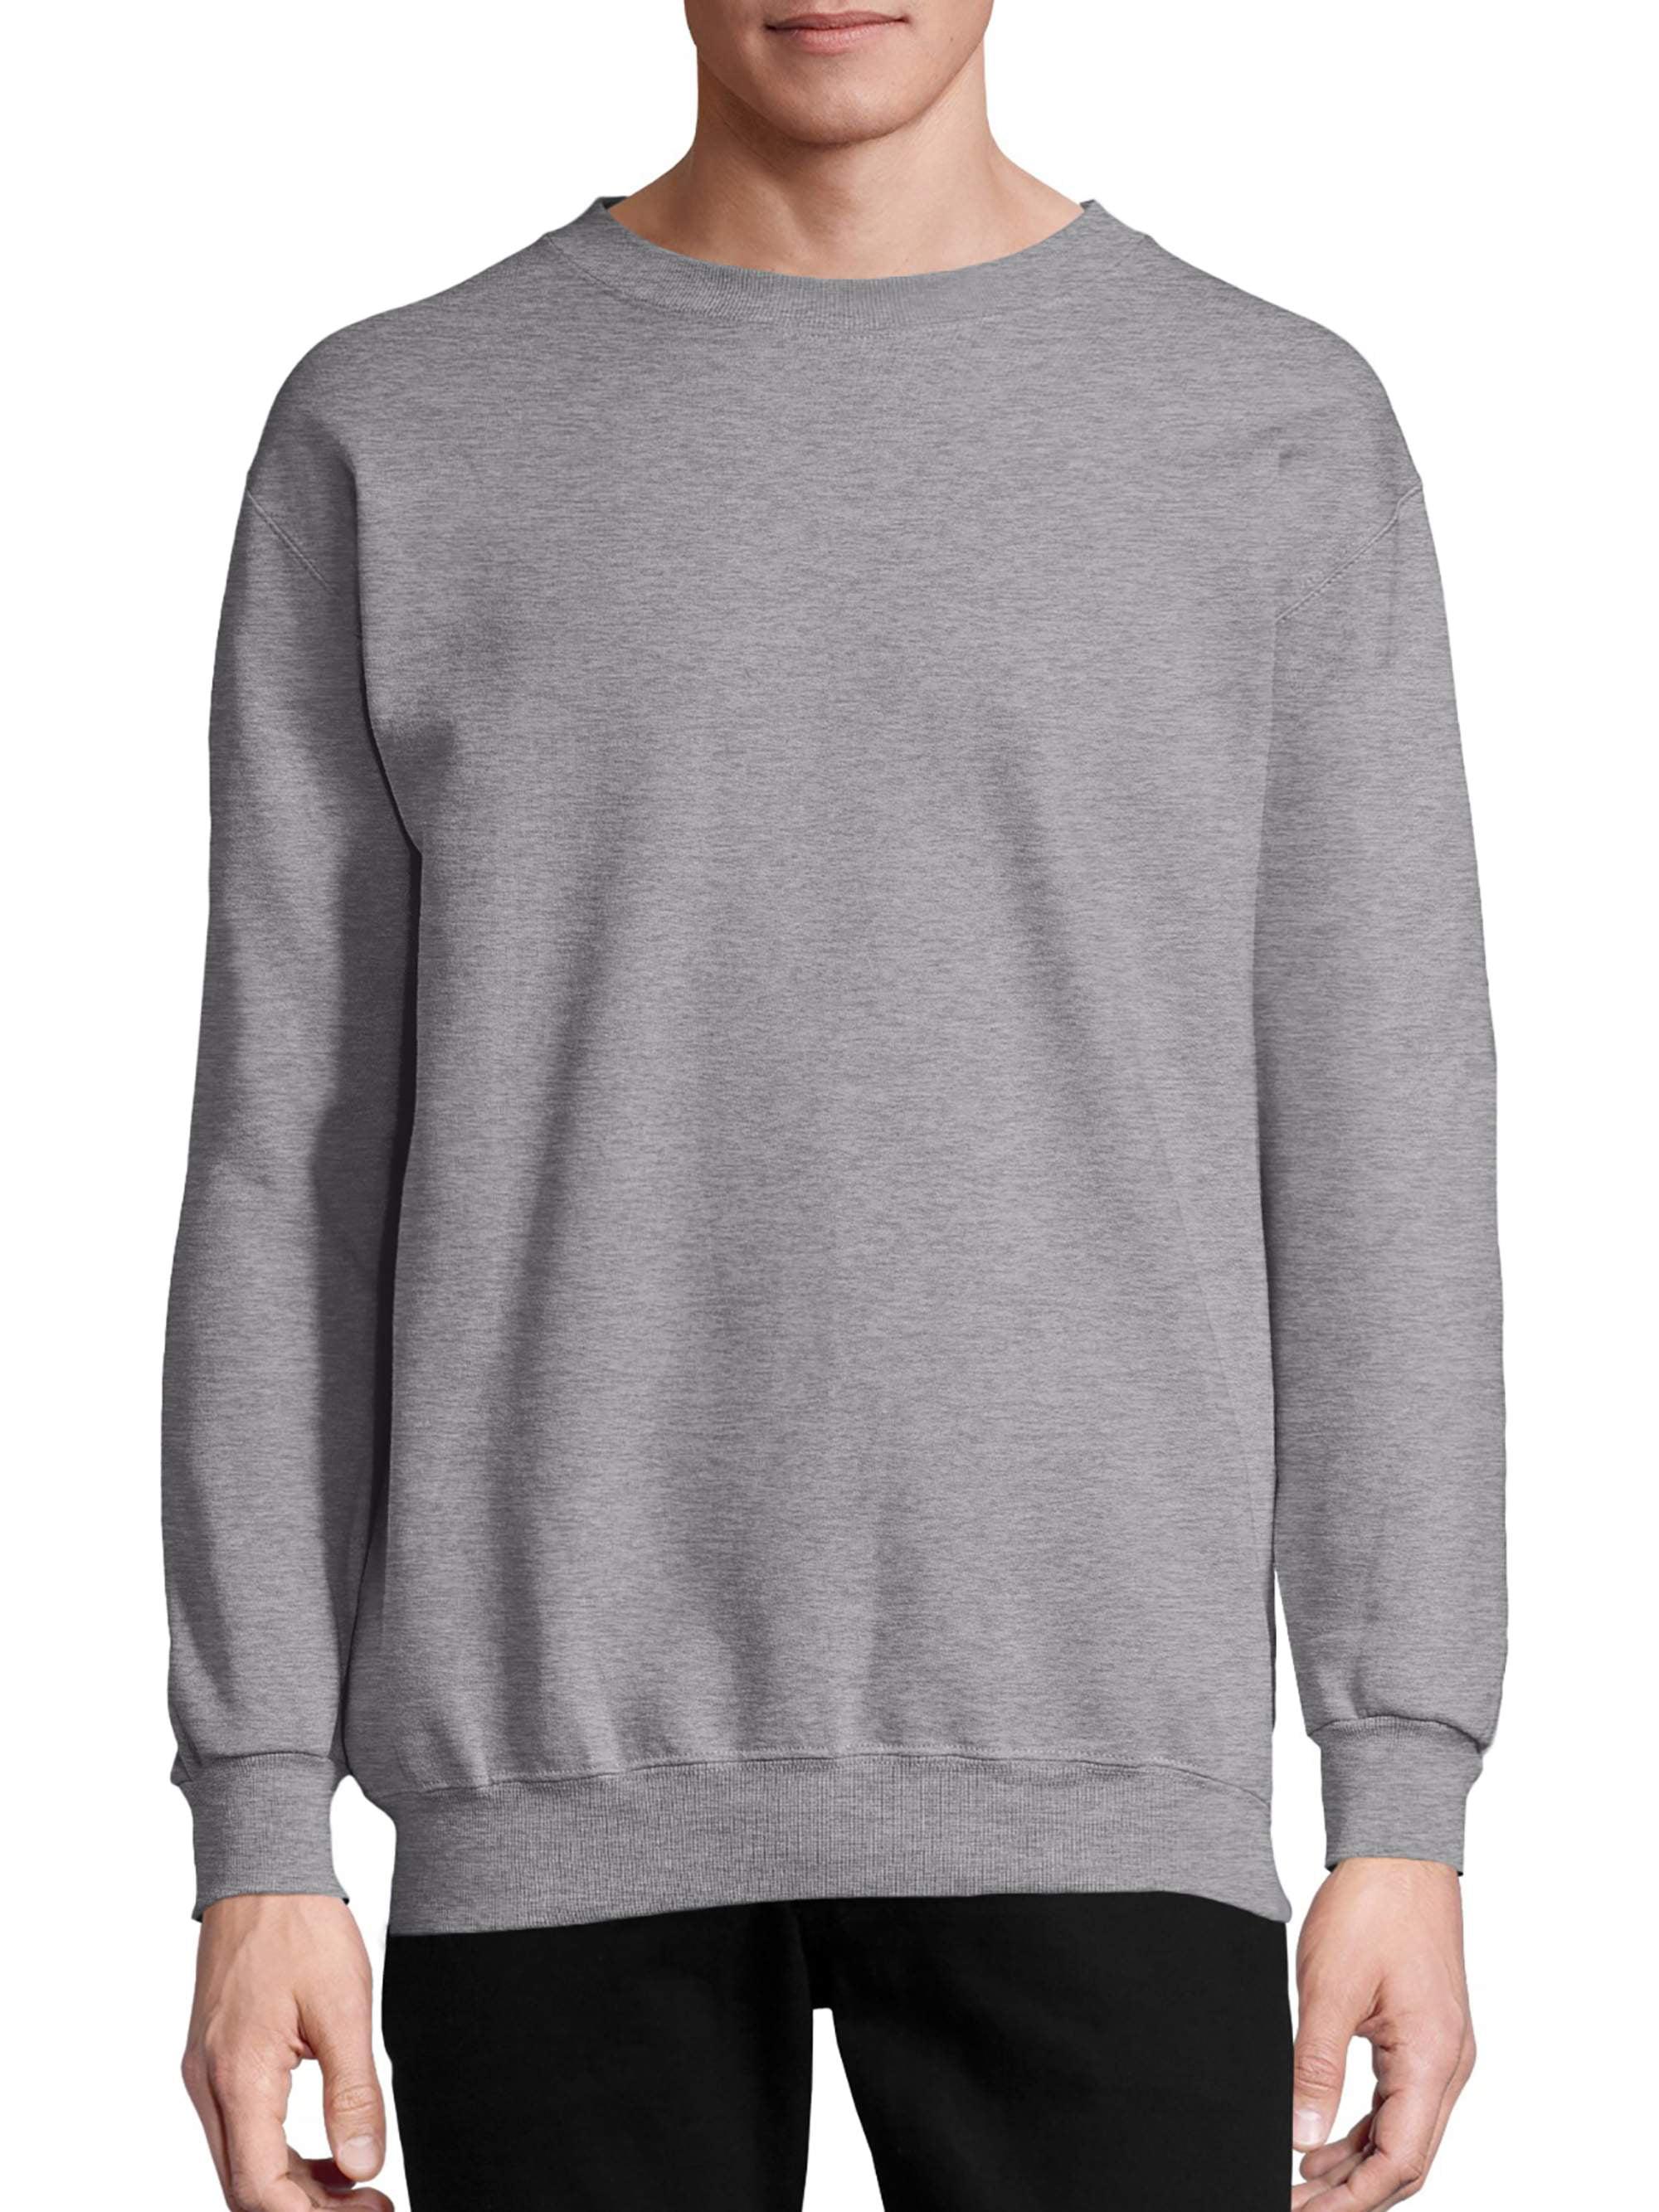 Adult Small Hanes Brand Cotton//Polyester Crewneck Men/'s Sweatshirts